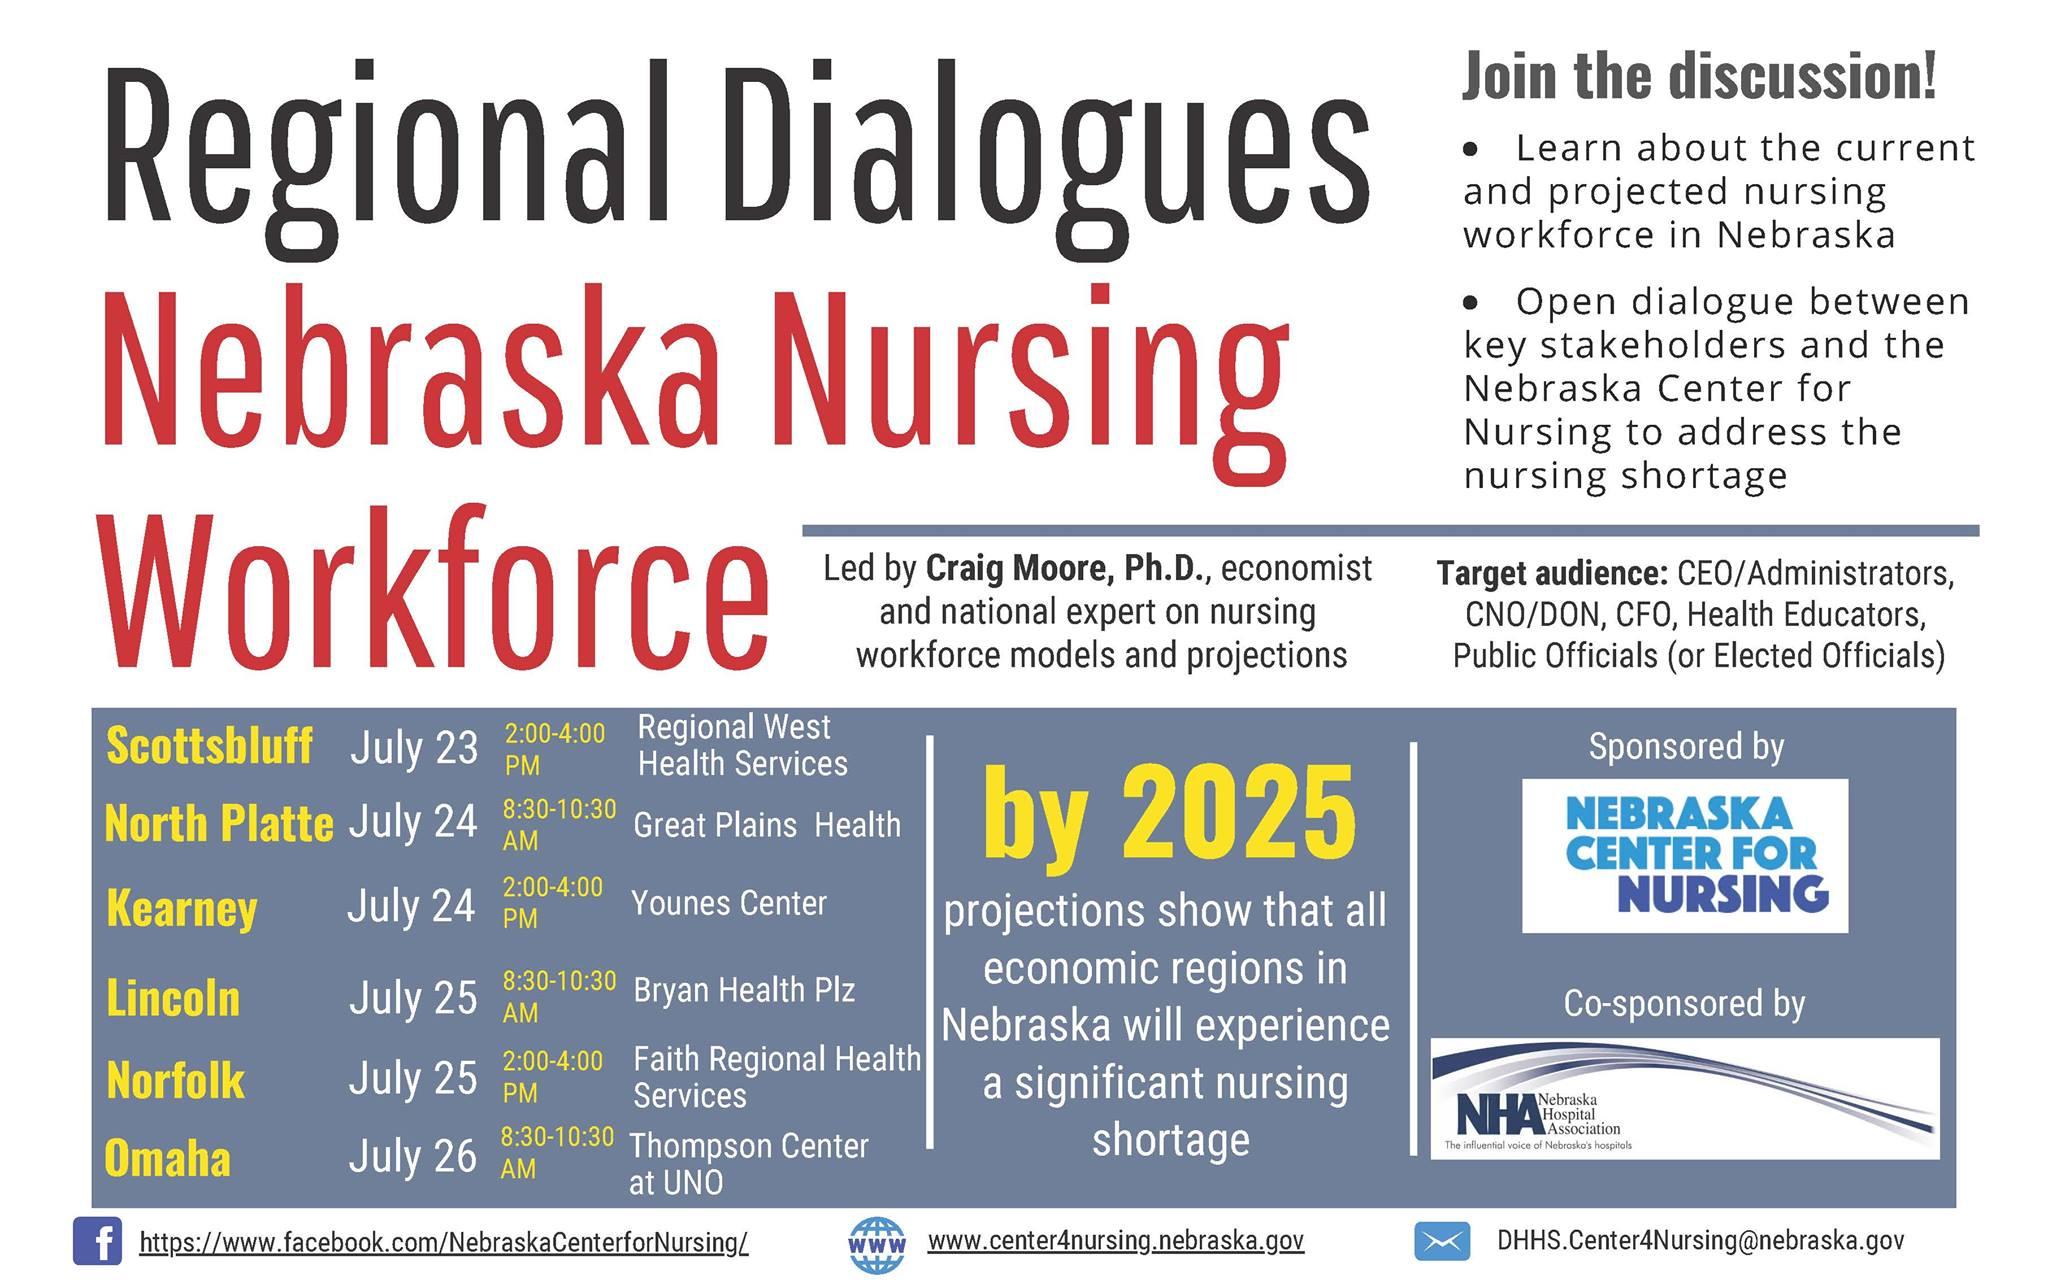 Regional Dialogues Nebraska Nursing Workforce